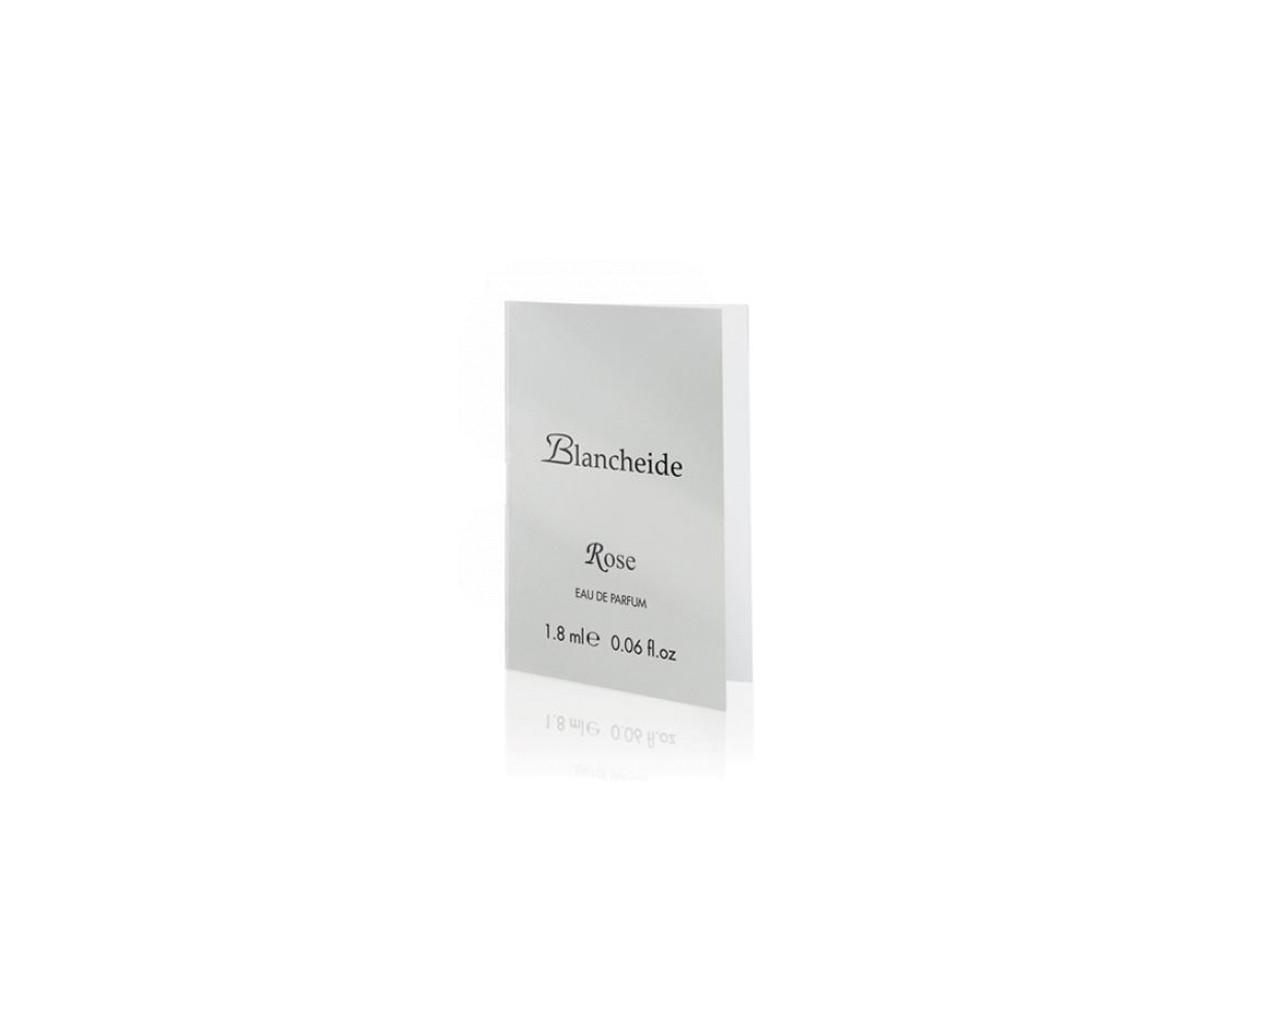 Campioncino Rose Blancheide EDP 1,8 ml Blancheide BLAS001RO-02